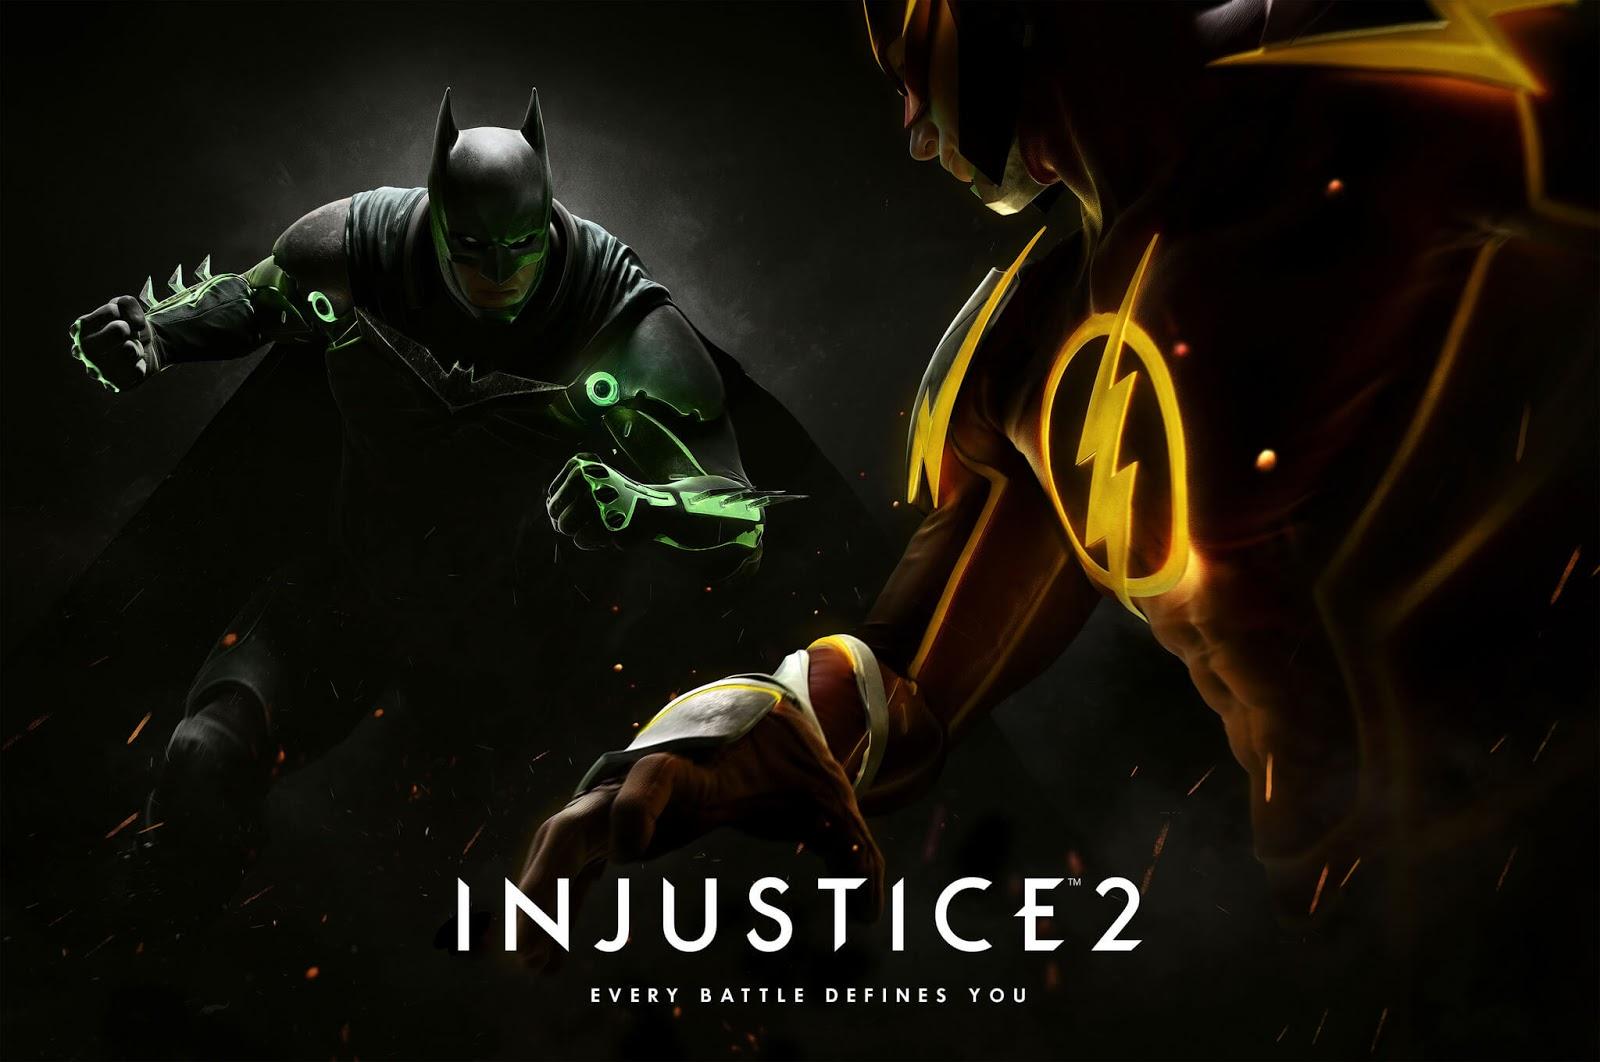 injustice 2 batman and flash